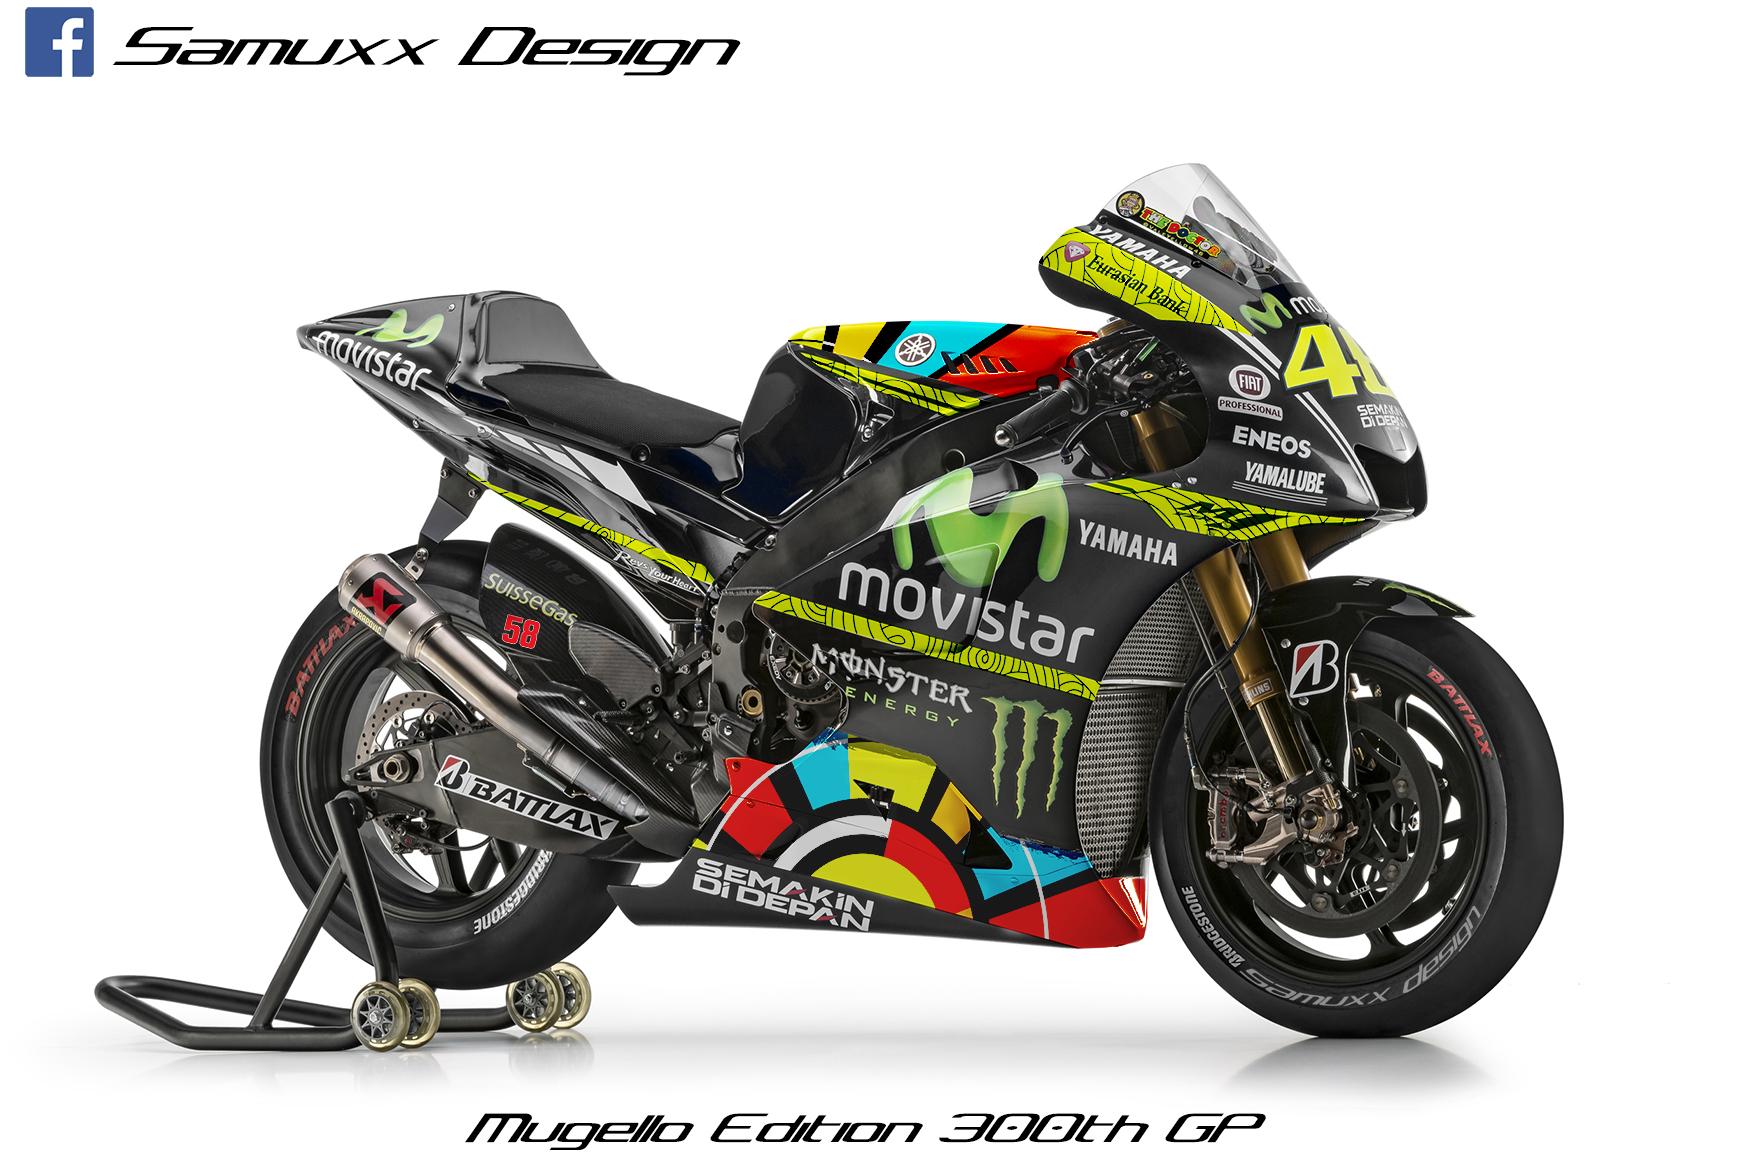 Yamaha M1 Valentino Rossi Mugello 2014 by SAMUXX on DeviantArt